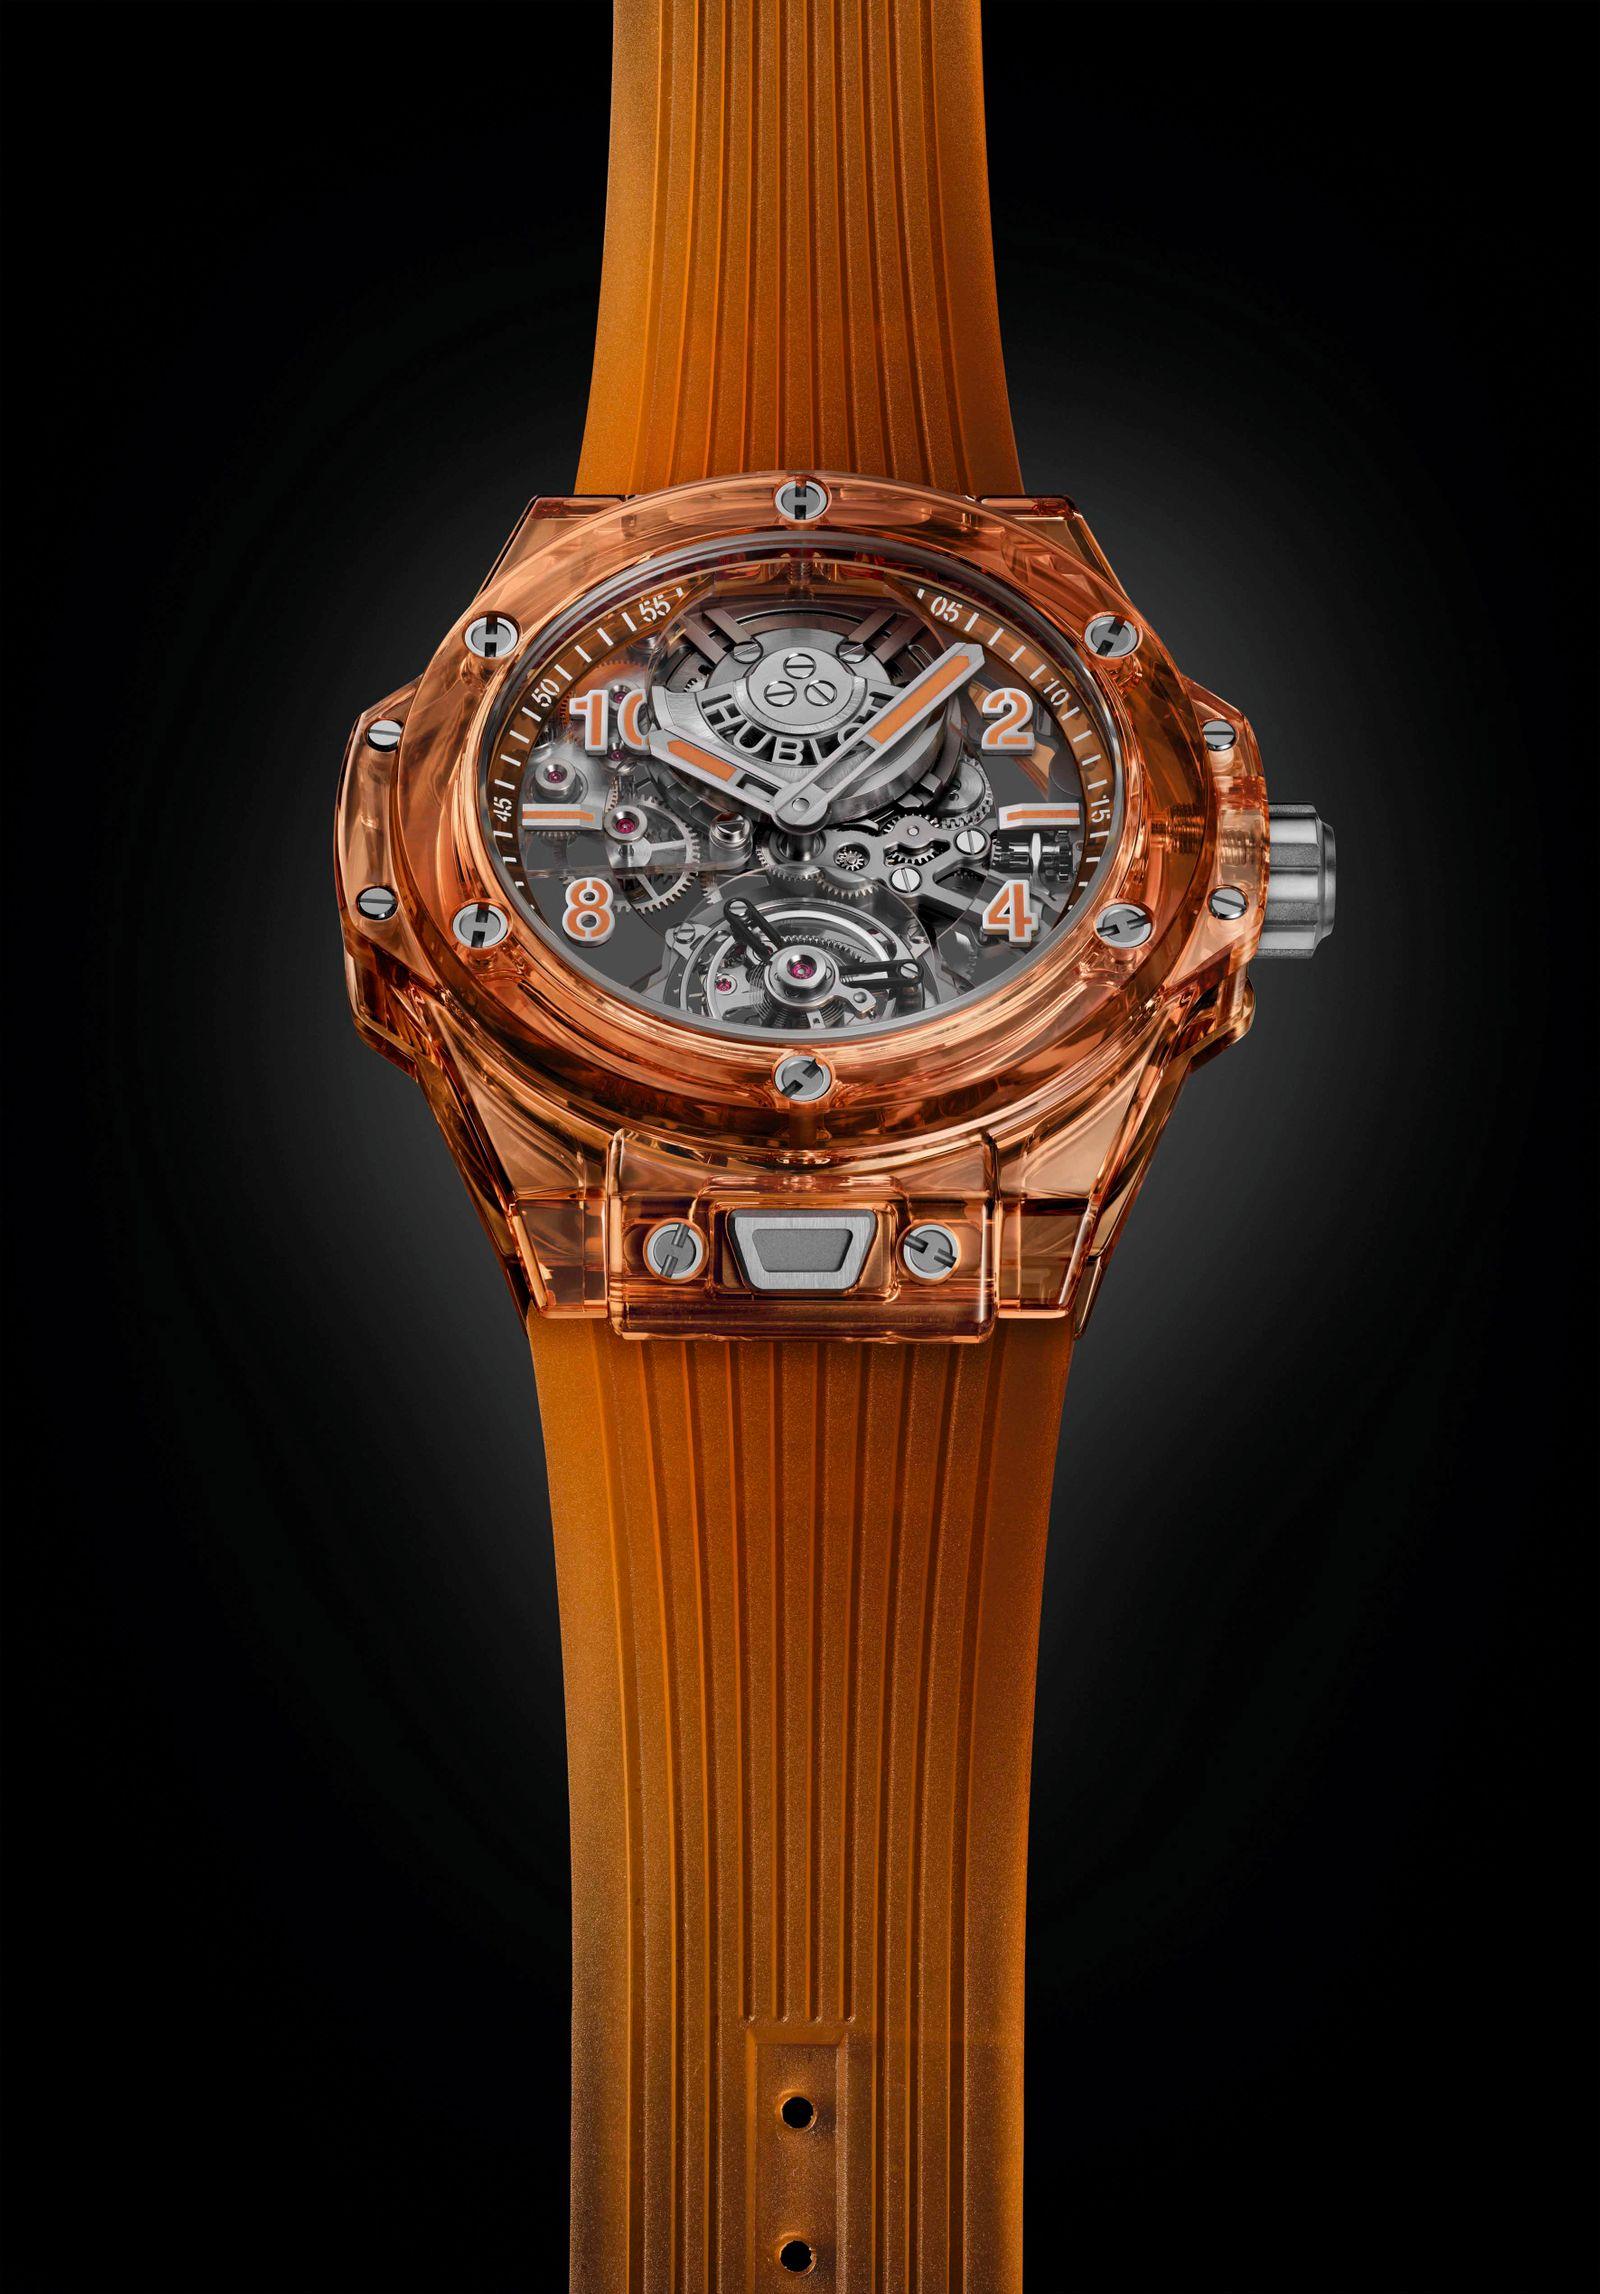 SIHH | Watches and Wonders | Hublot Big Bang Tourbillon Automatic Orange Sapphire